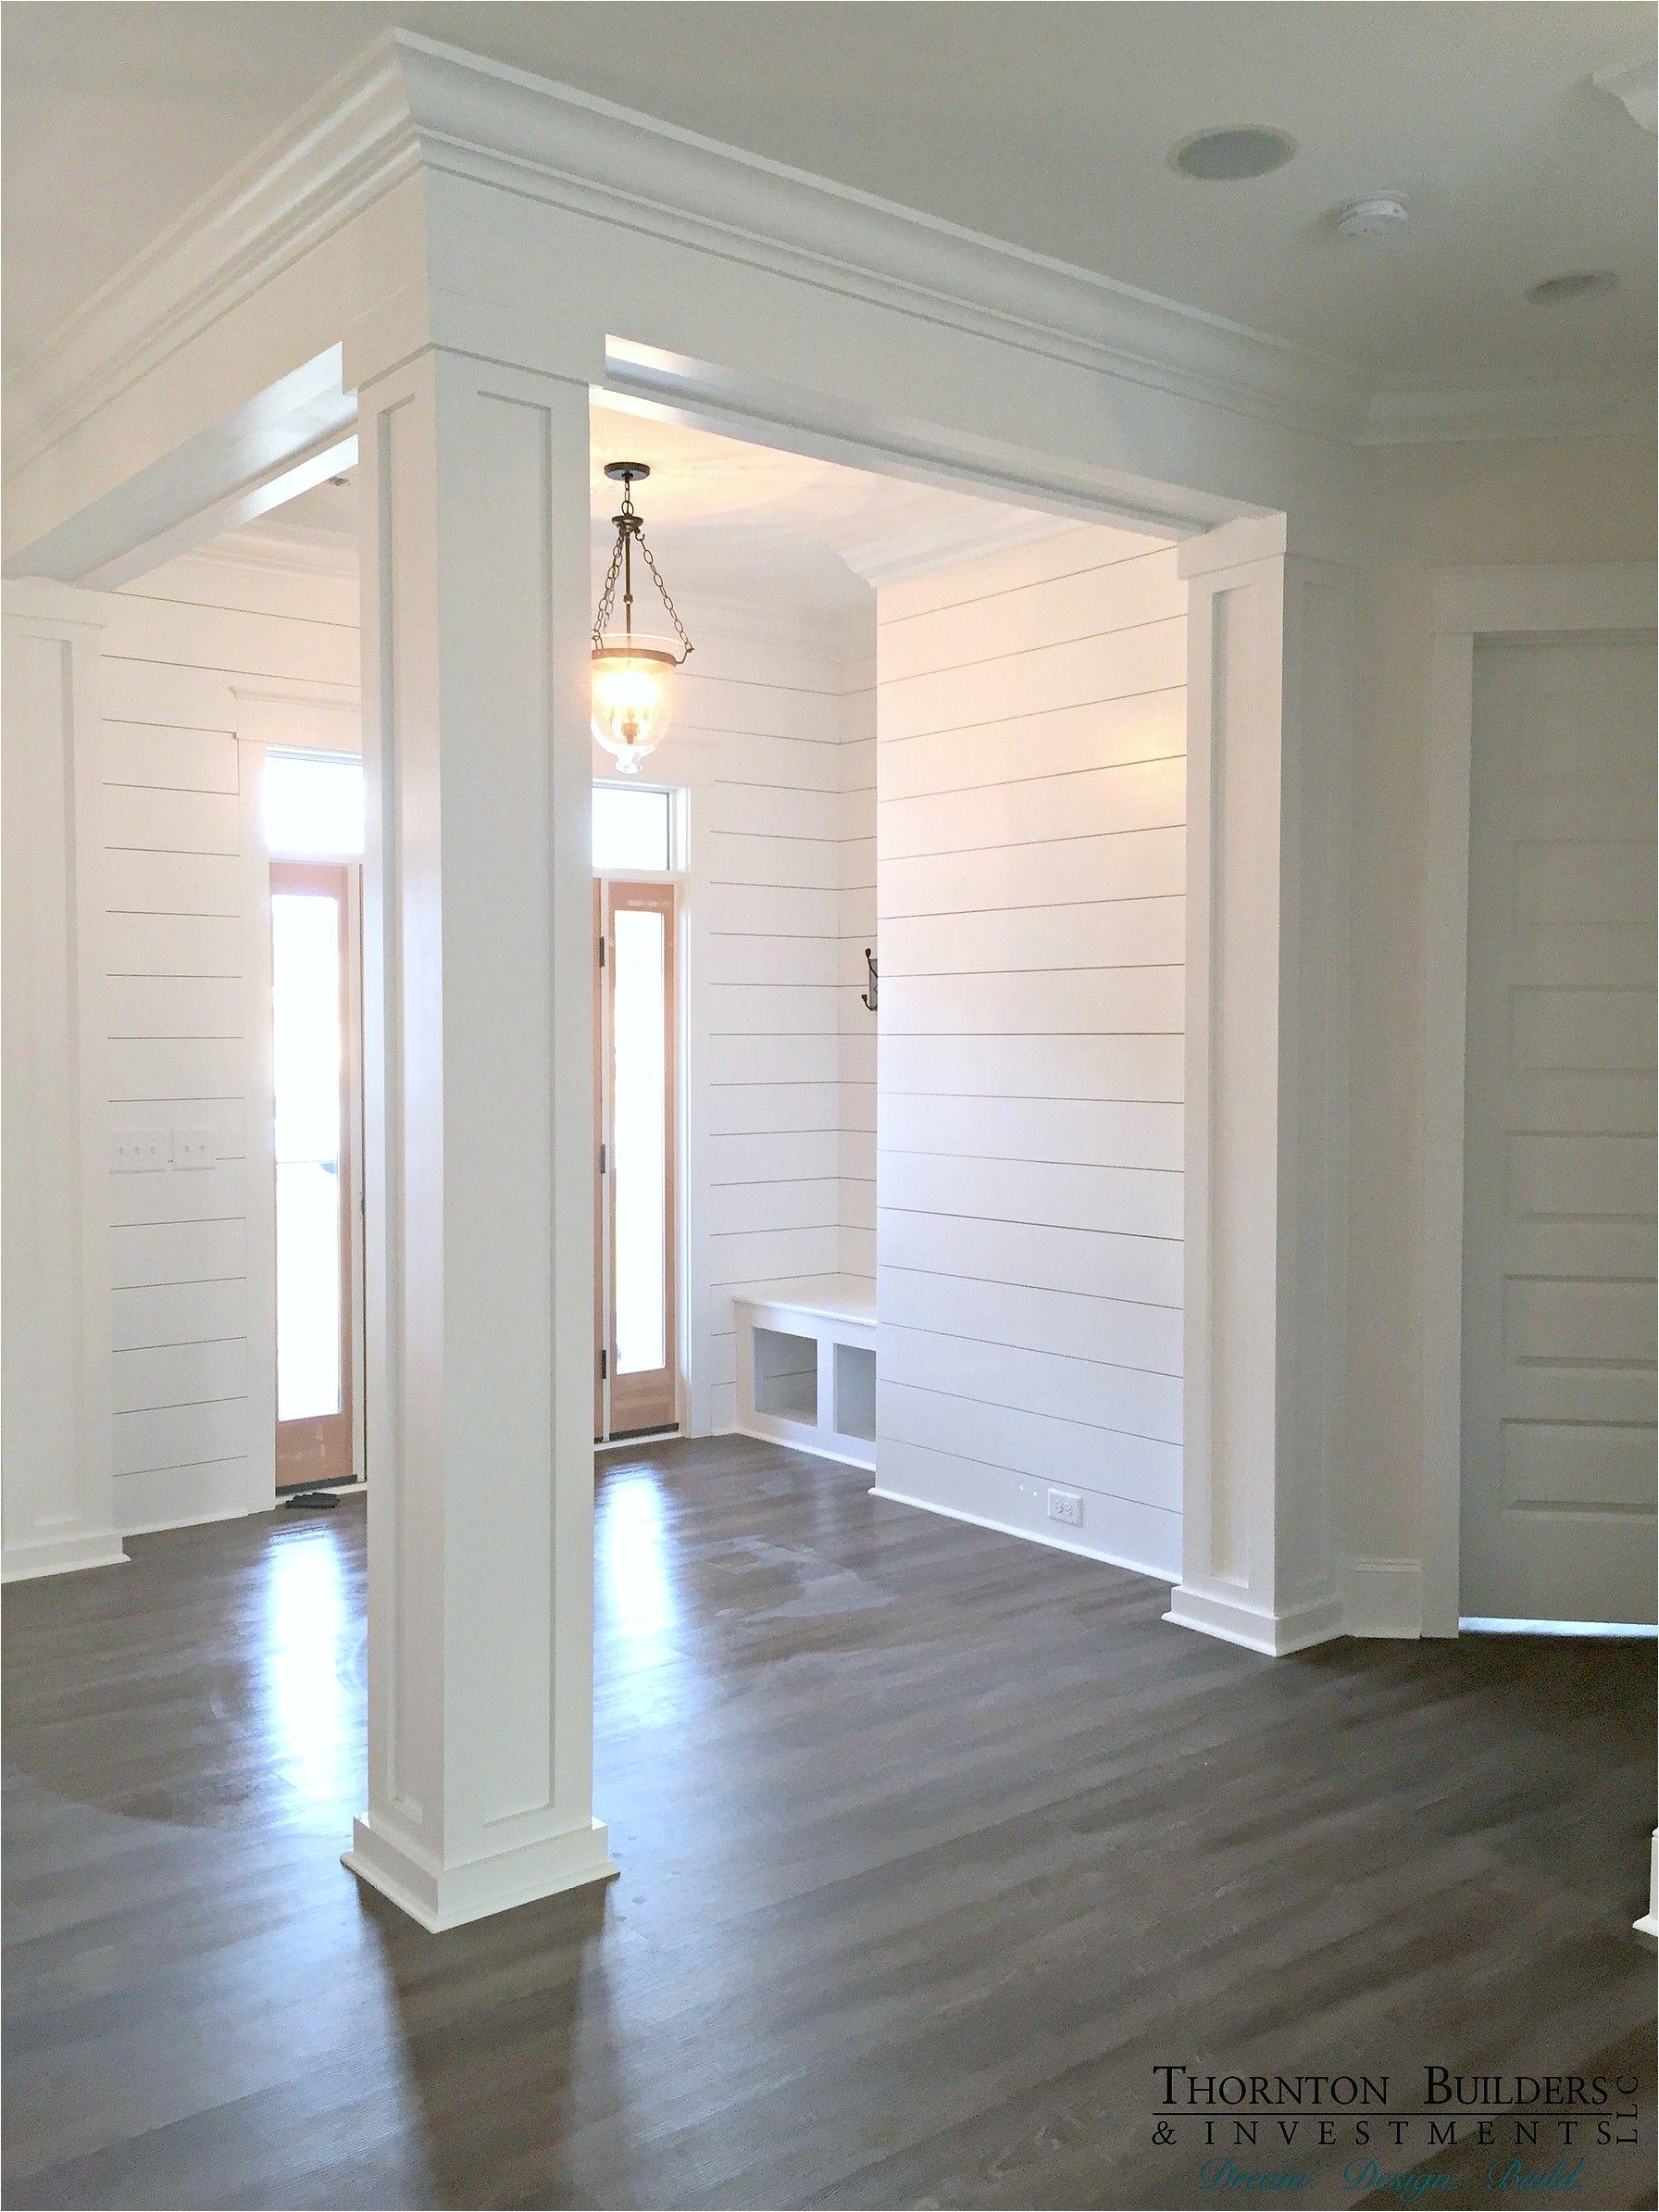 Decorative Interior Column Wraps Thornton Builders the Modern Farmhouse Beautiful Home